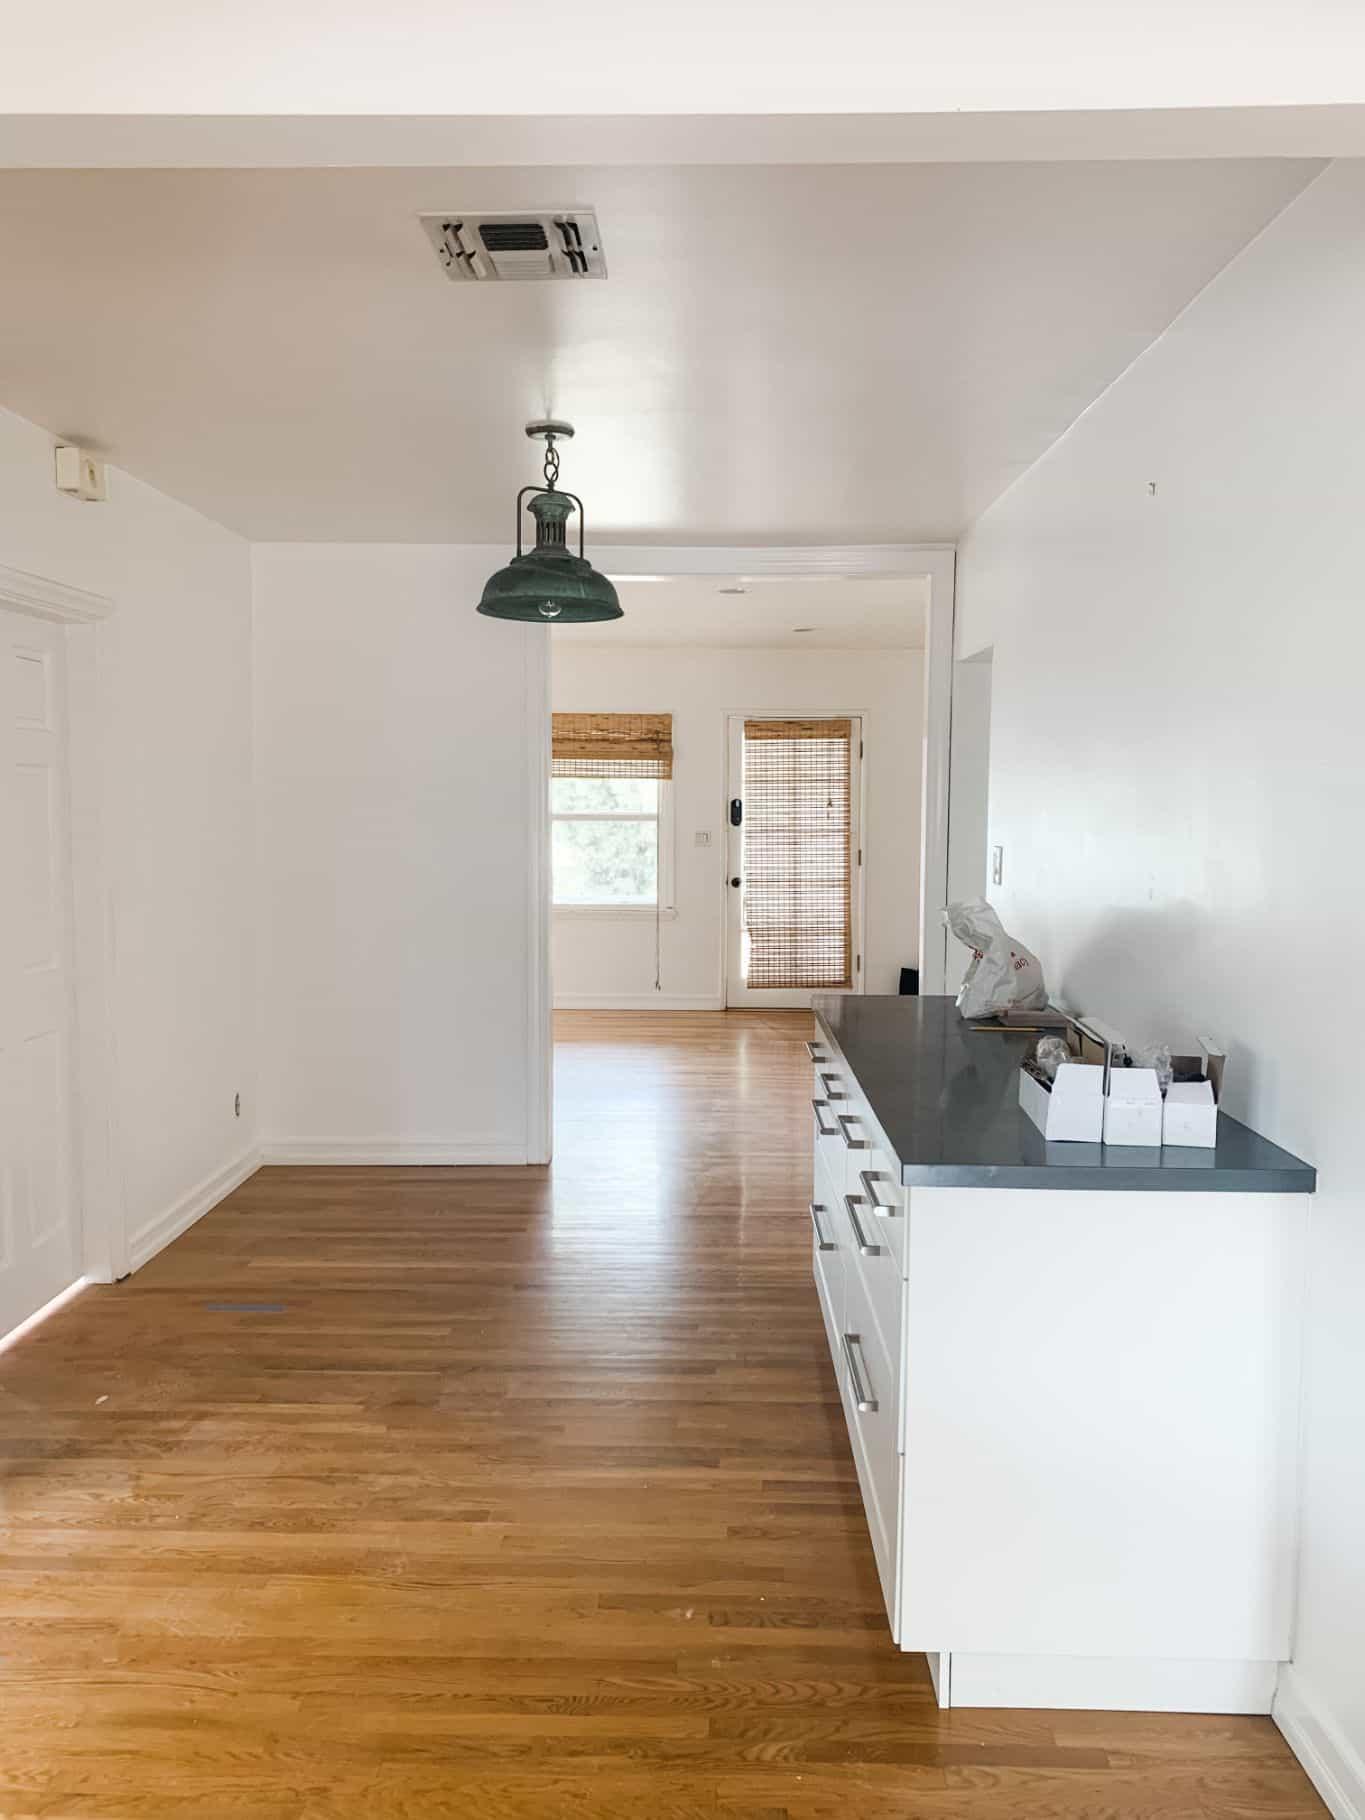 The Cottage Renovation - Mindy Gayer Design Co.